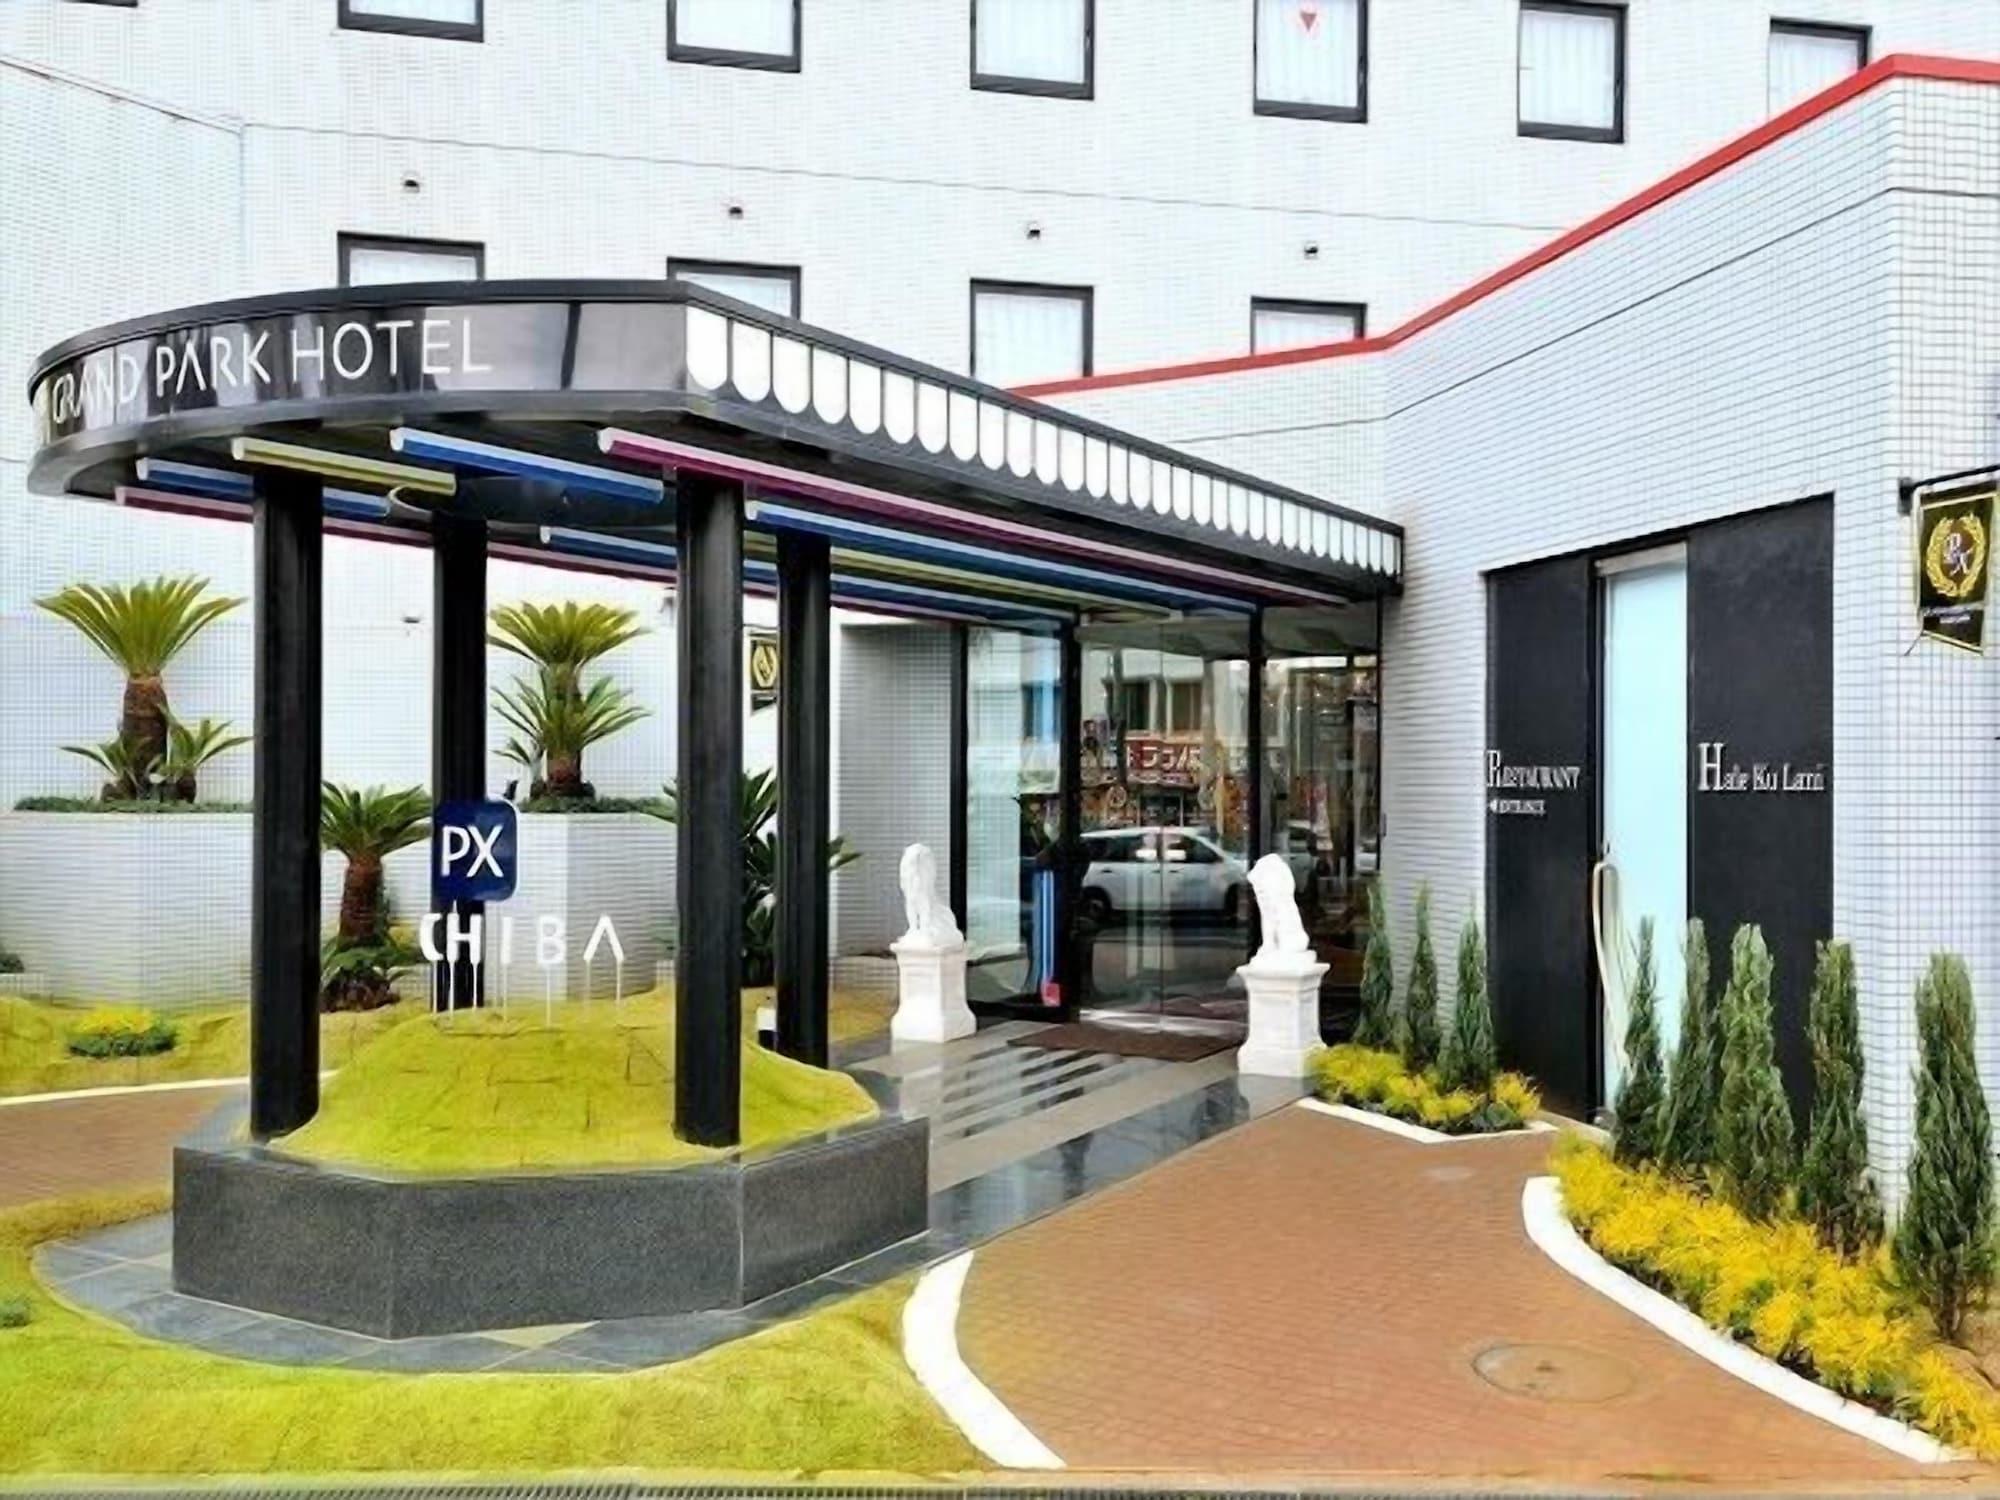 Grand Park Hotel Panex Chiba, Chiba